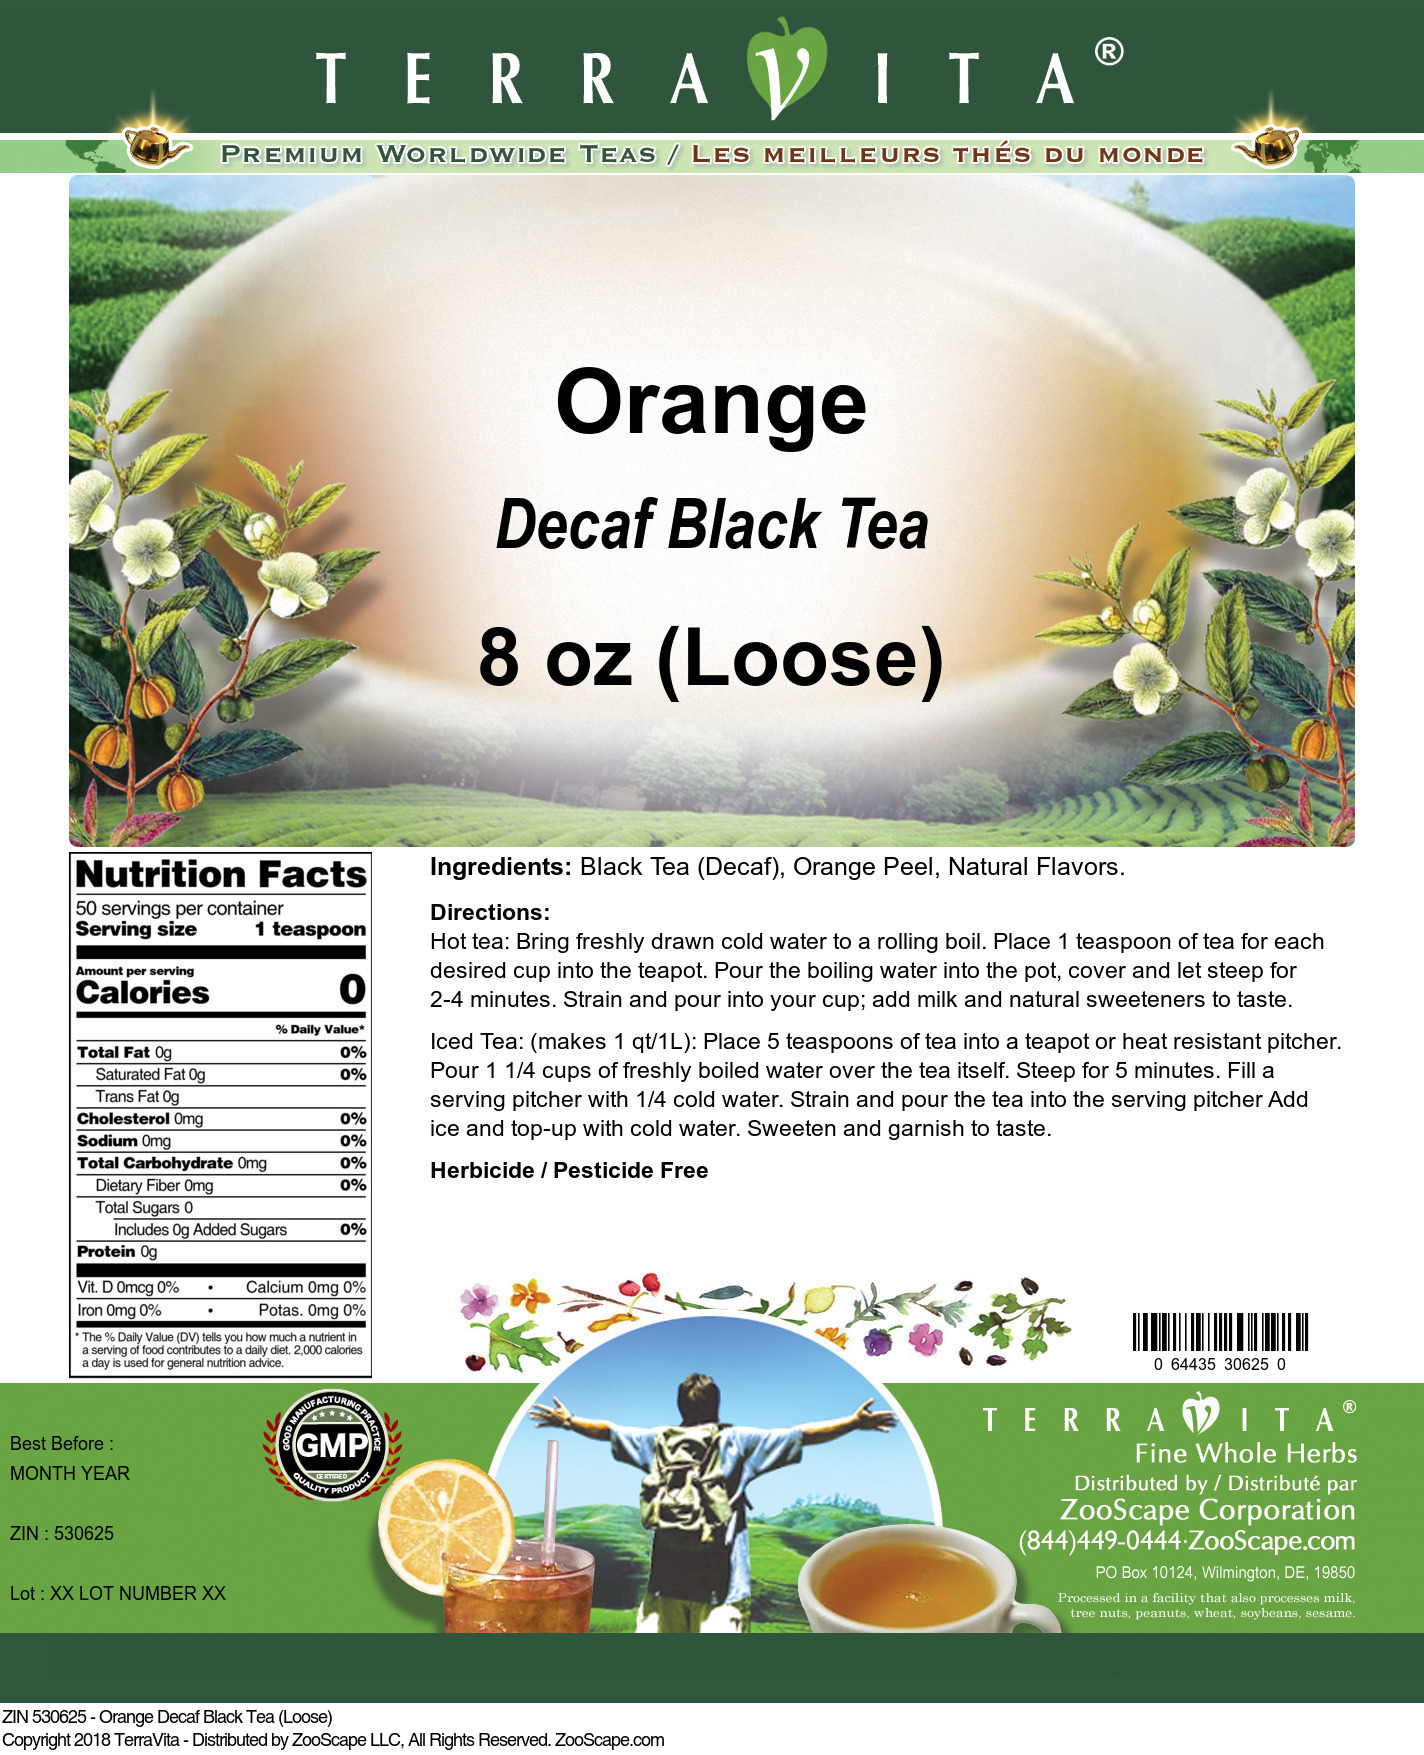 Orange Decaf Black Tea